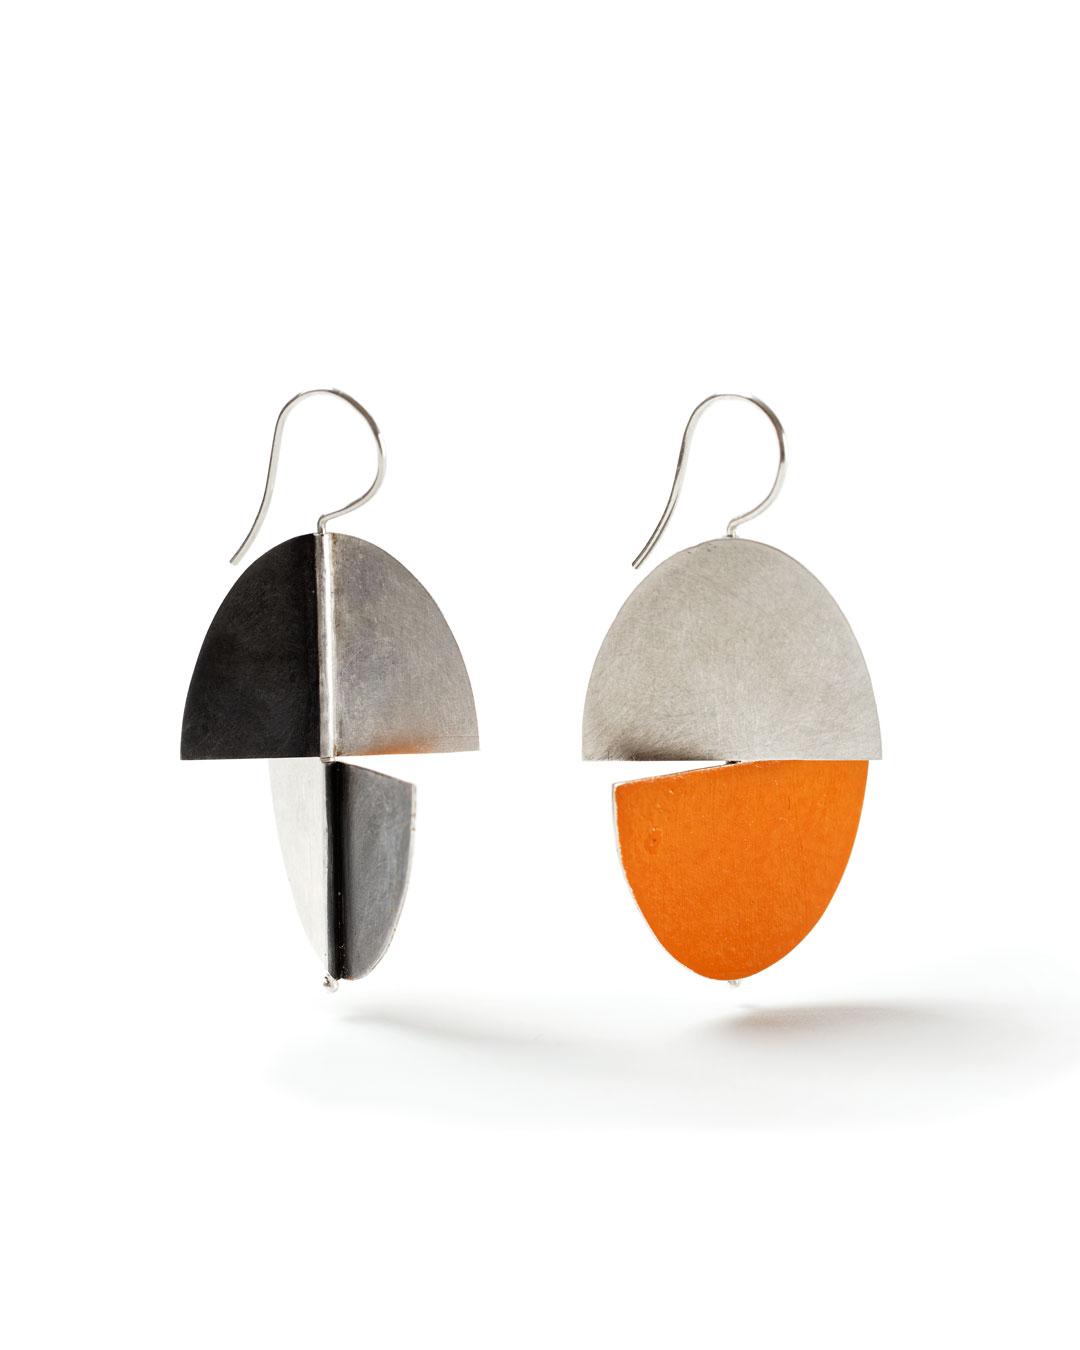 Julie Mollenhauer, untitled, 2018, earrings; silver, acrylic paint, 45 x 30 x 2 mm, €800